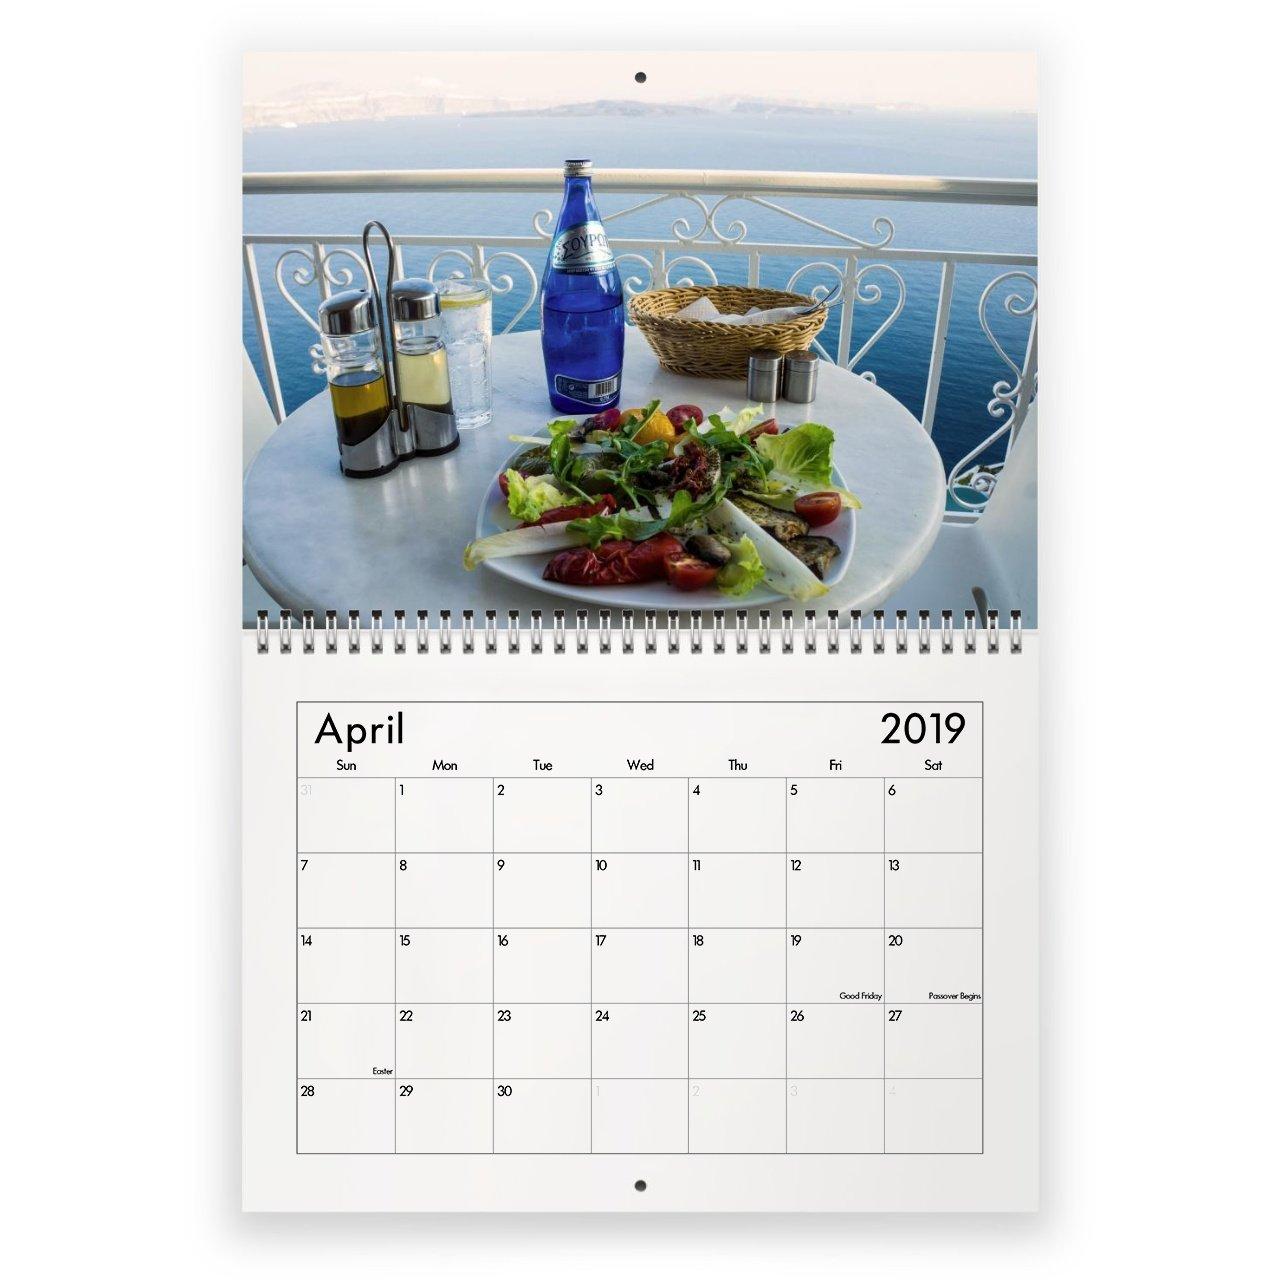 Greece 2019 Calendar Calendar 2019 Greece